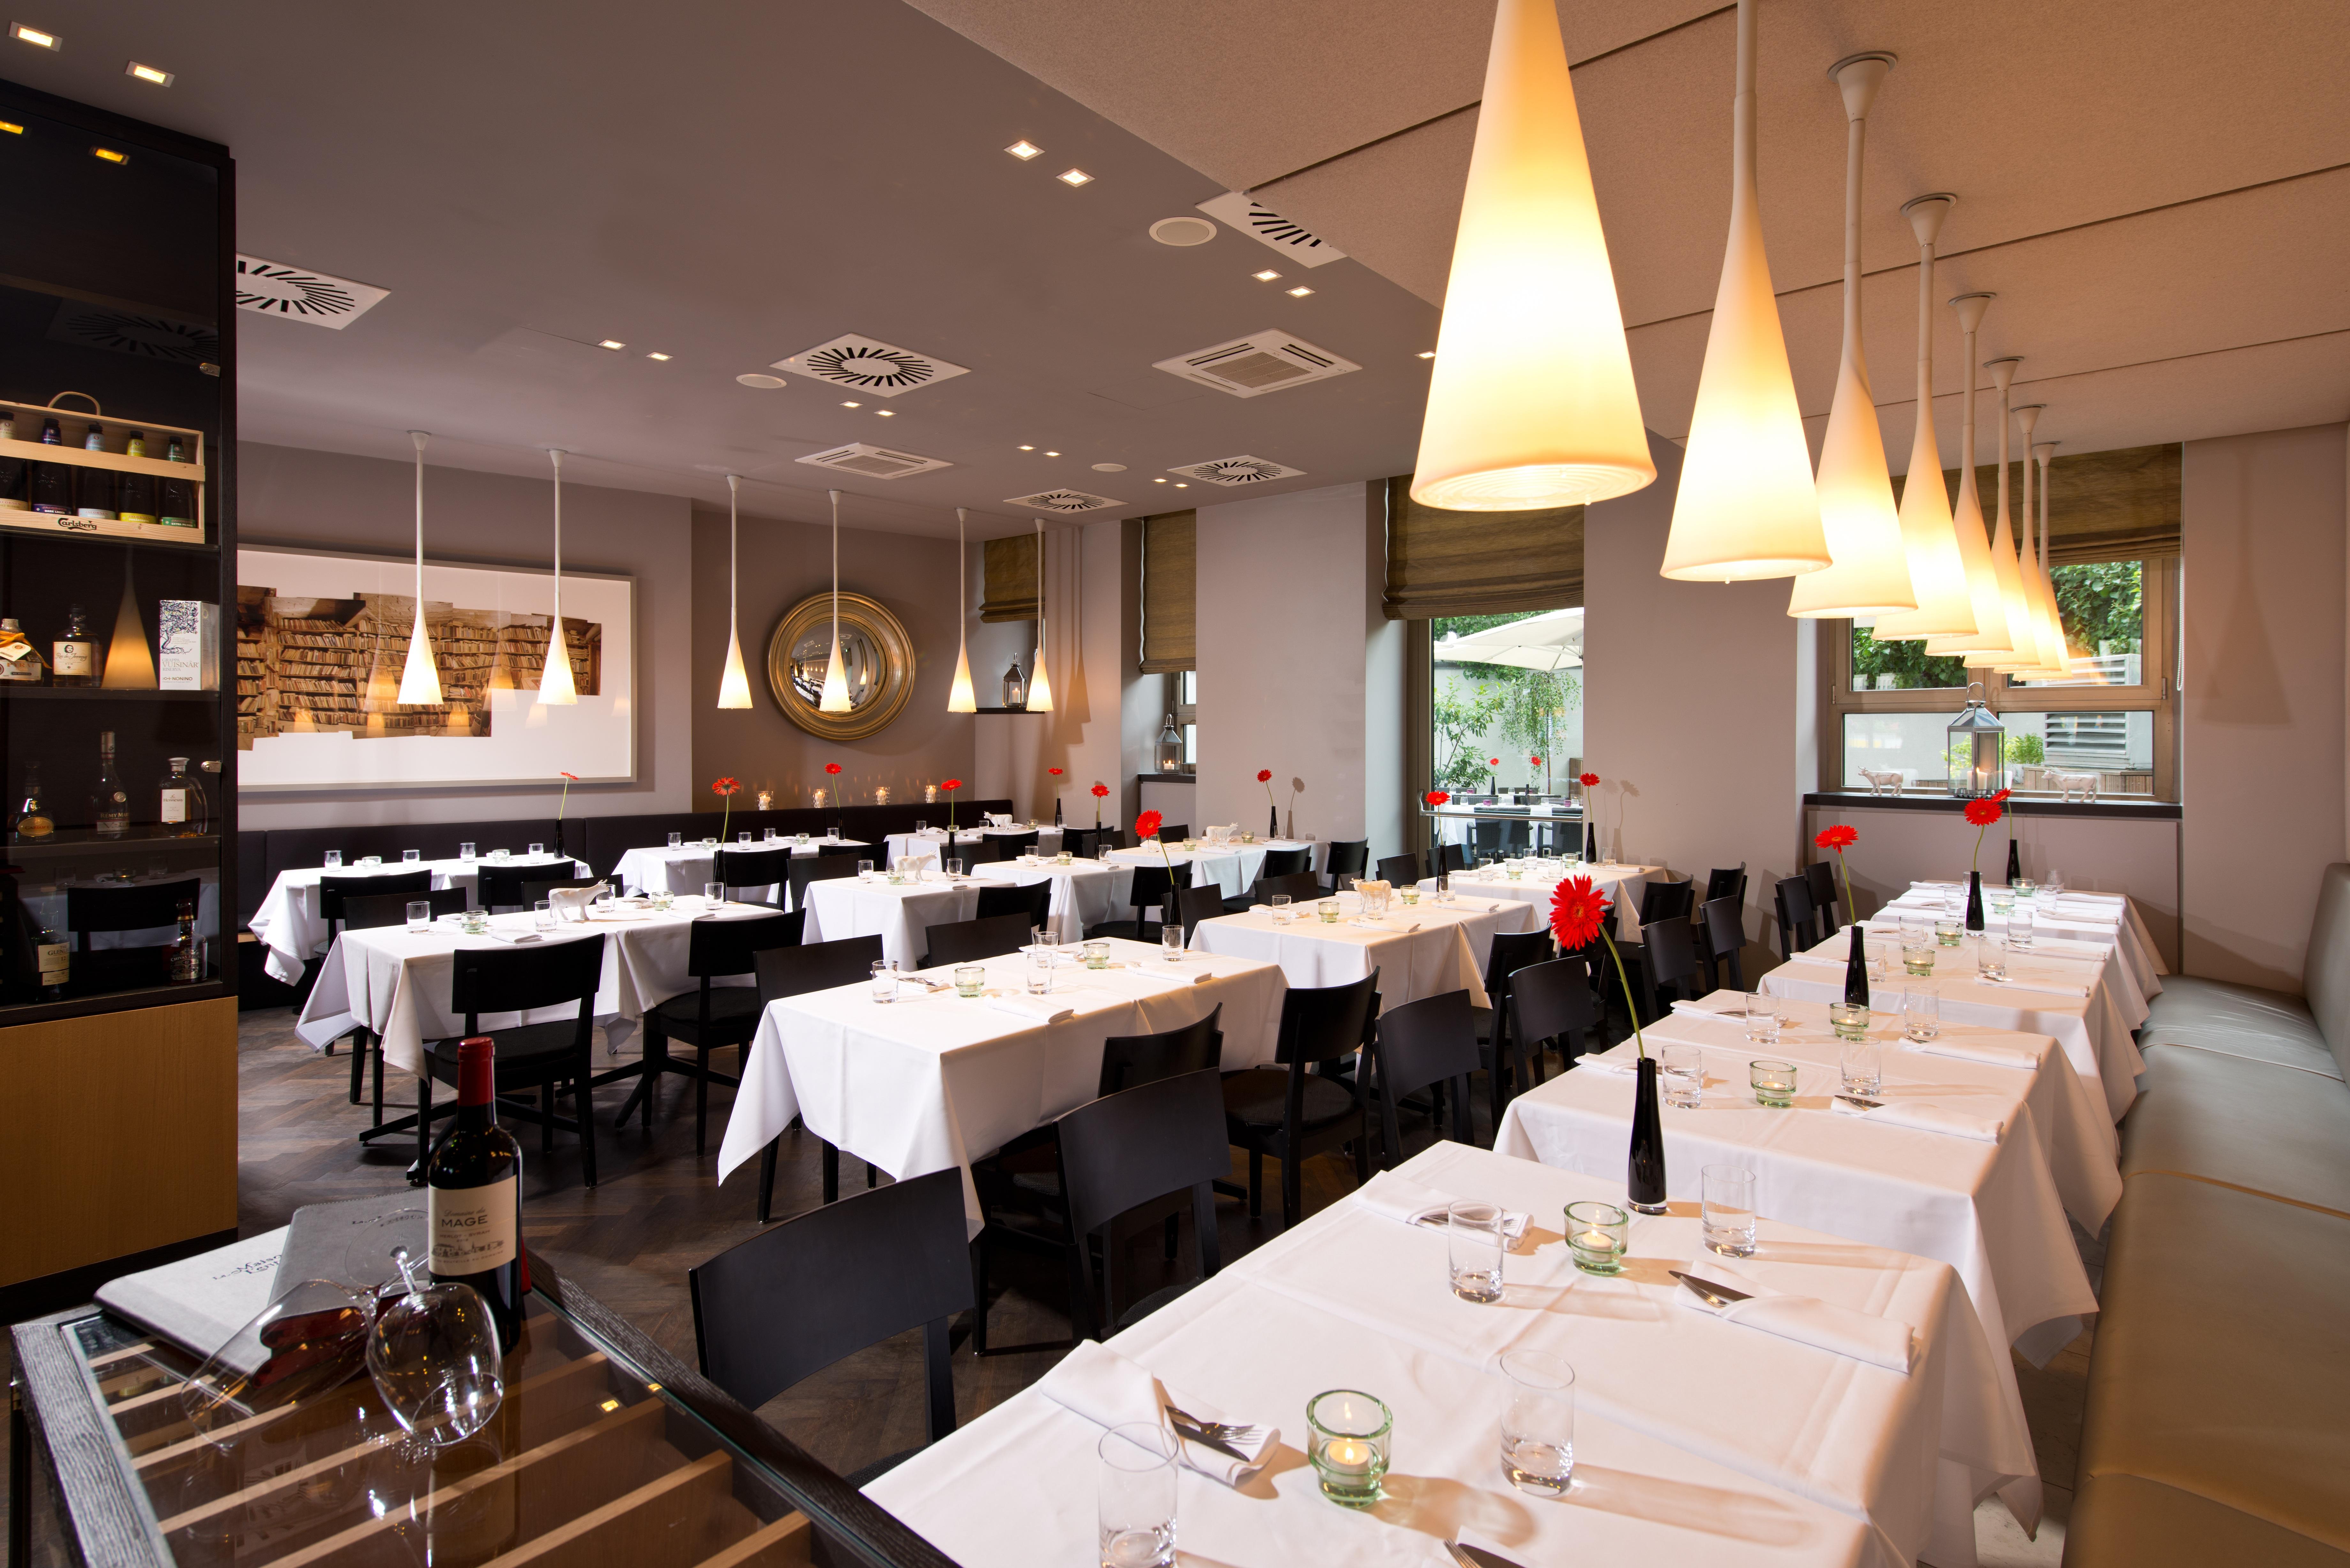 Free images : restaurant city meal modern interior design